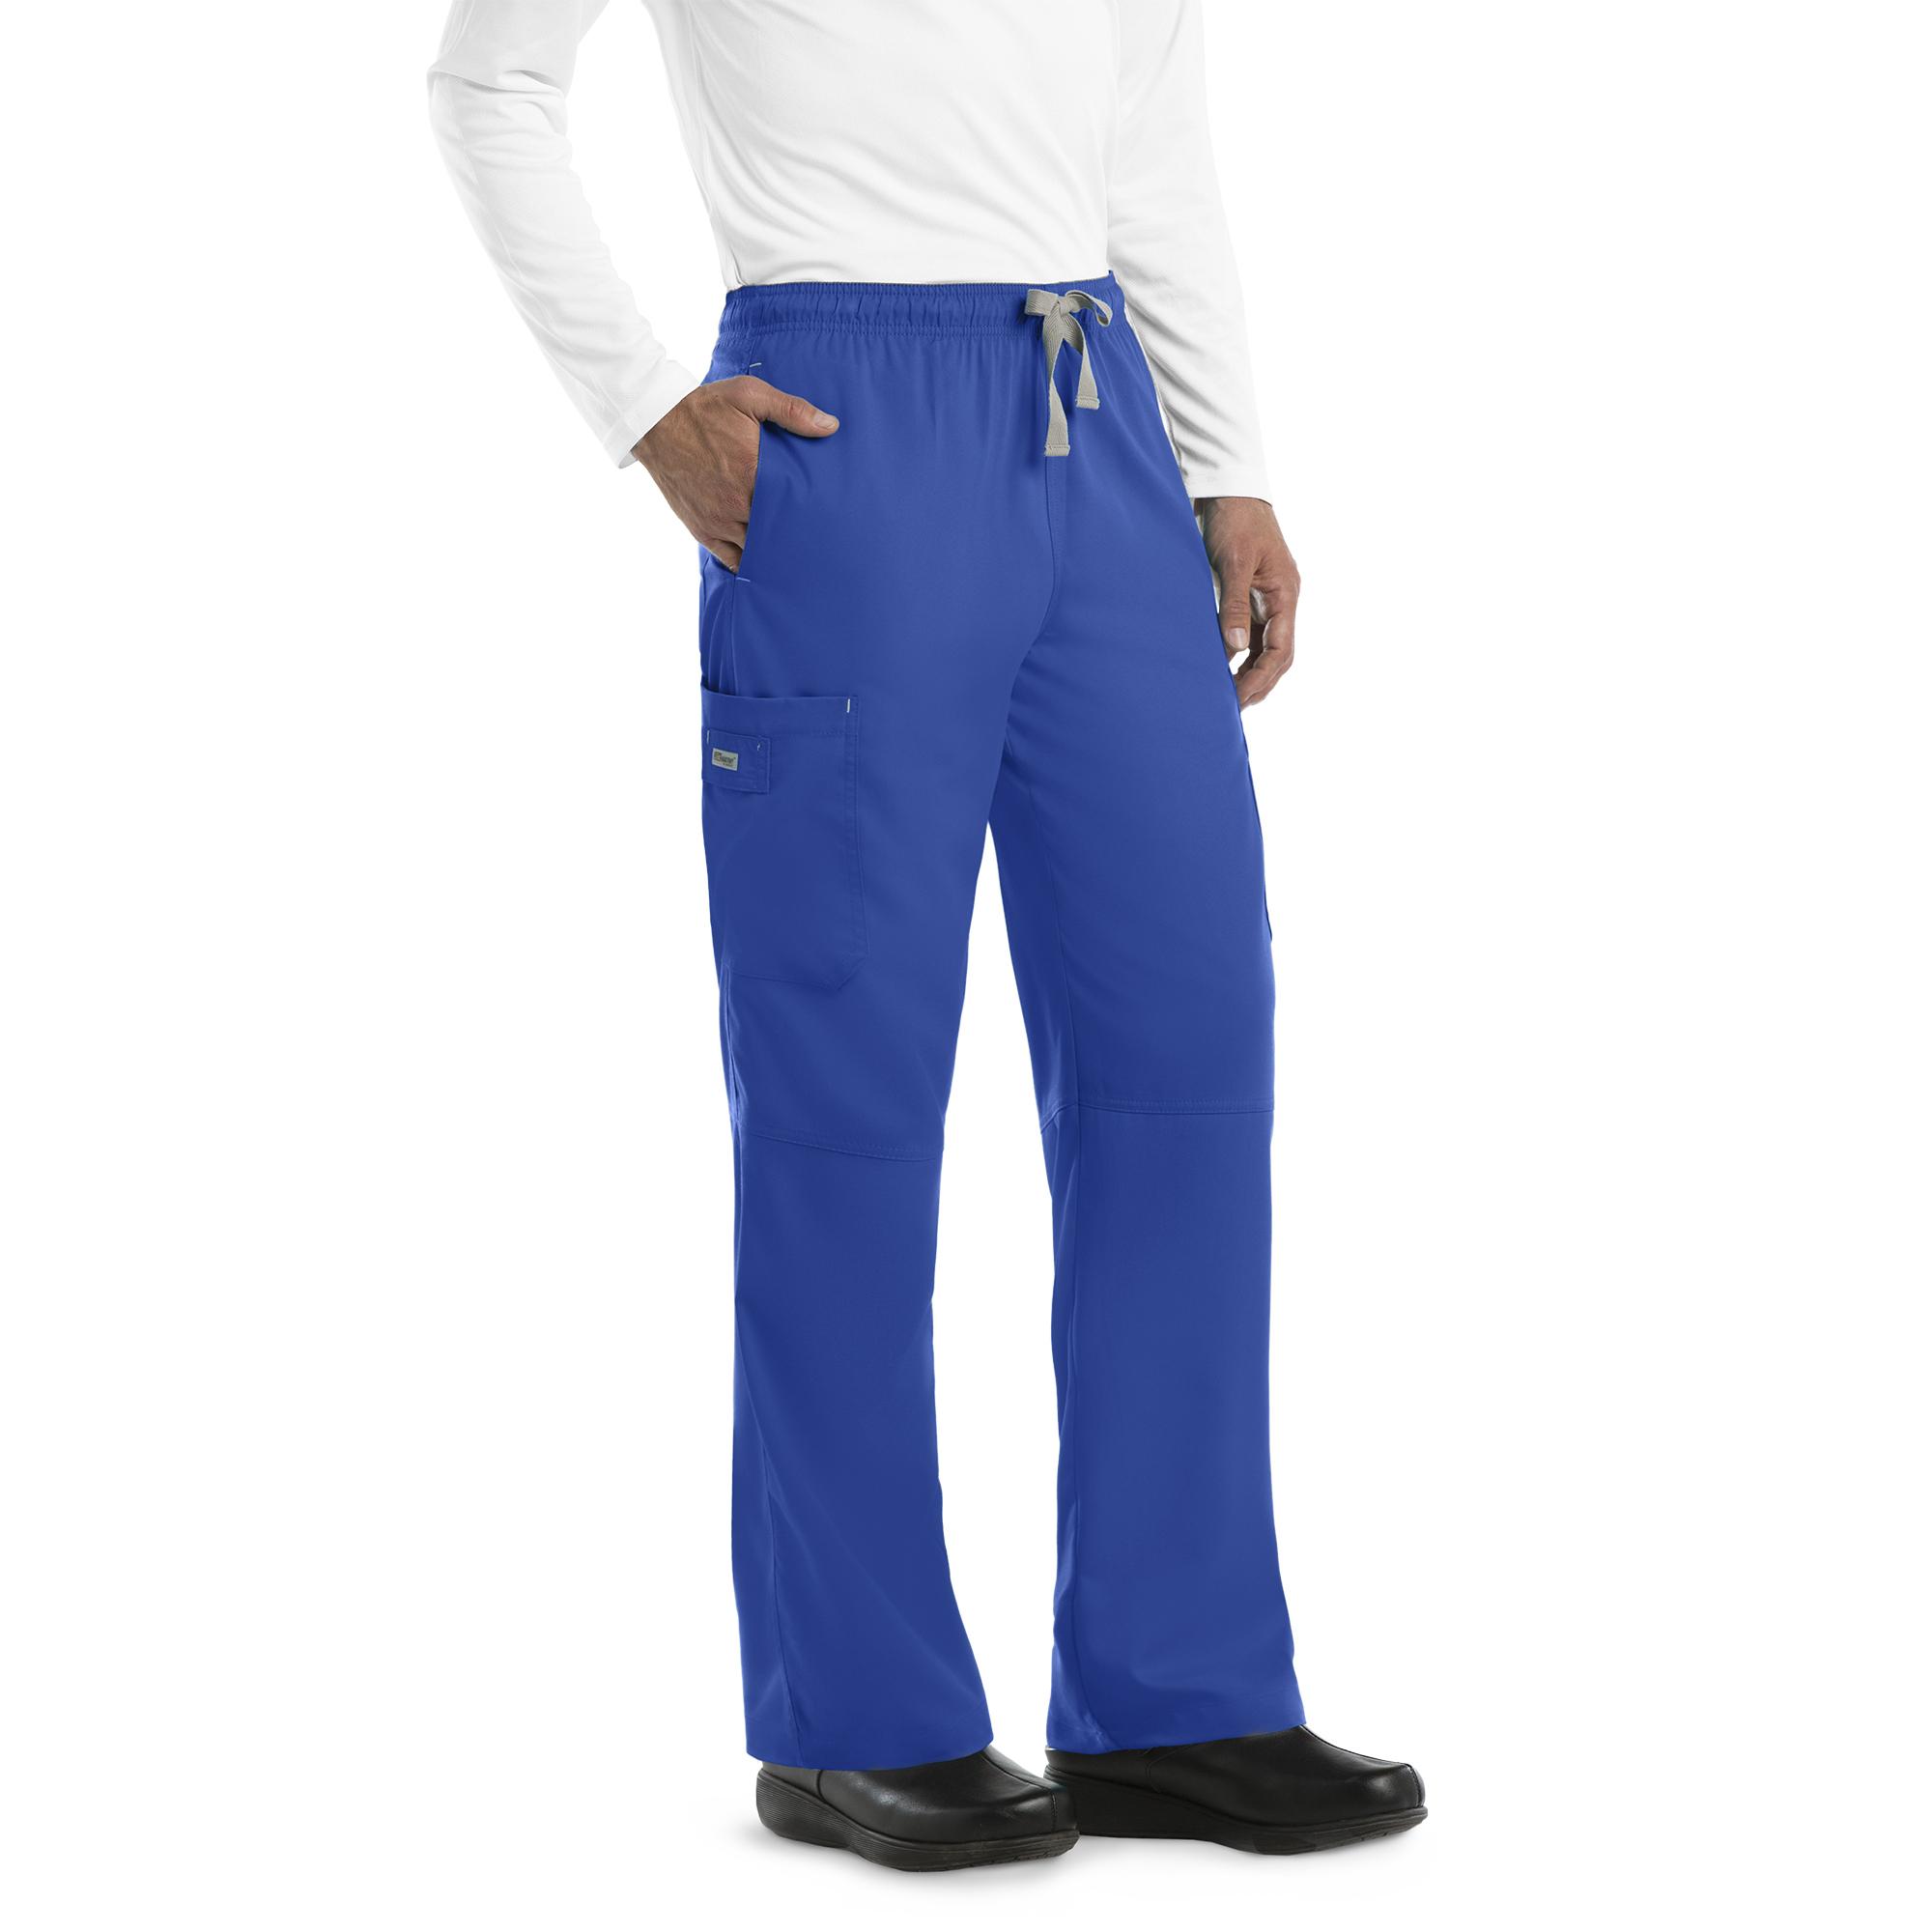 Grey's Anatomy Men's 6 Pocket Pant-Greys Anatomy